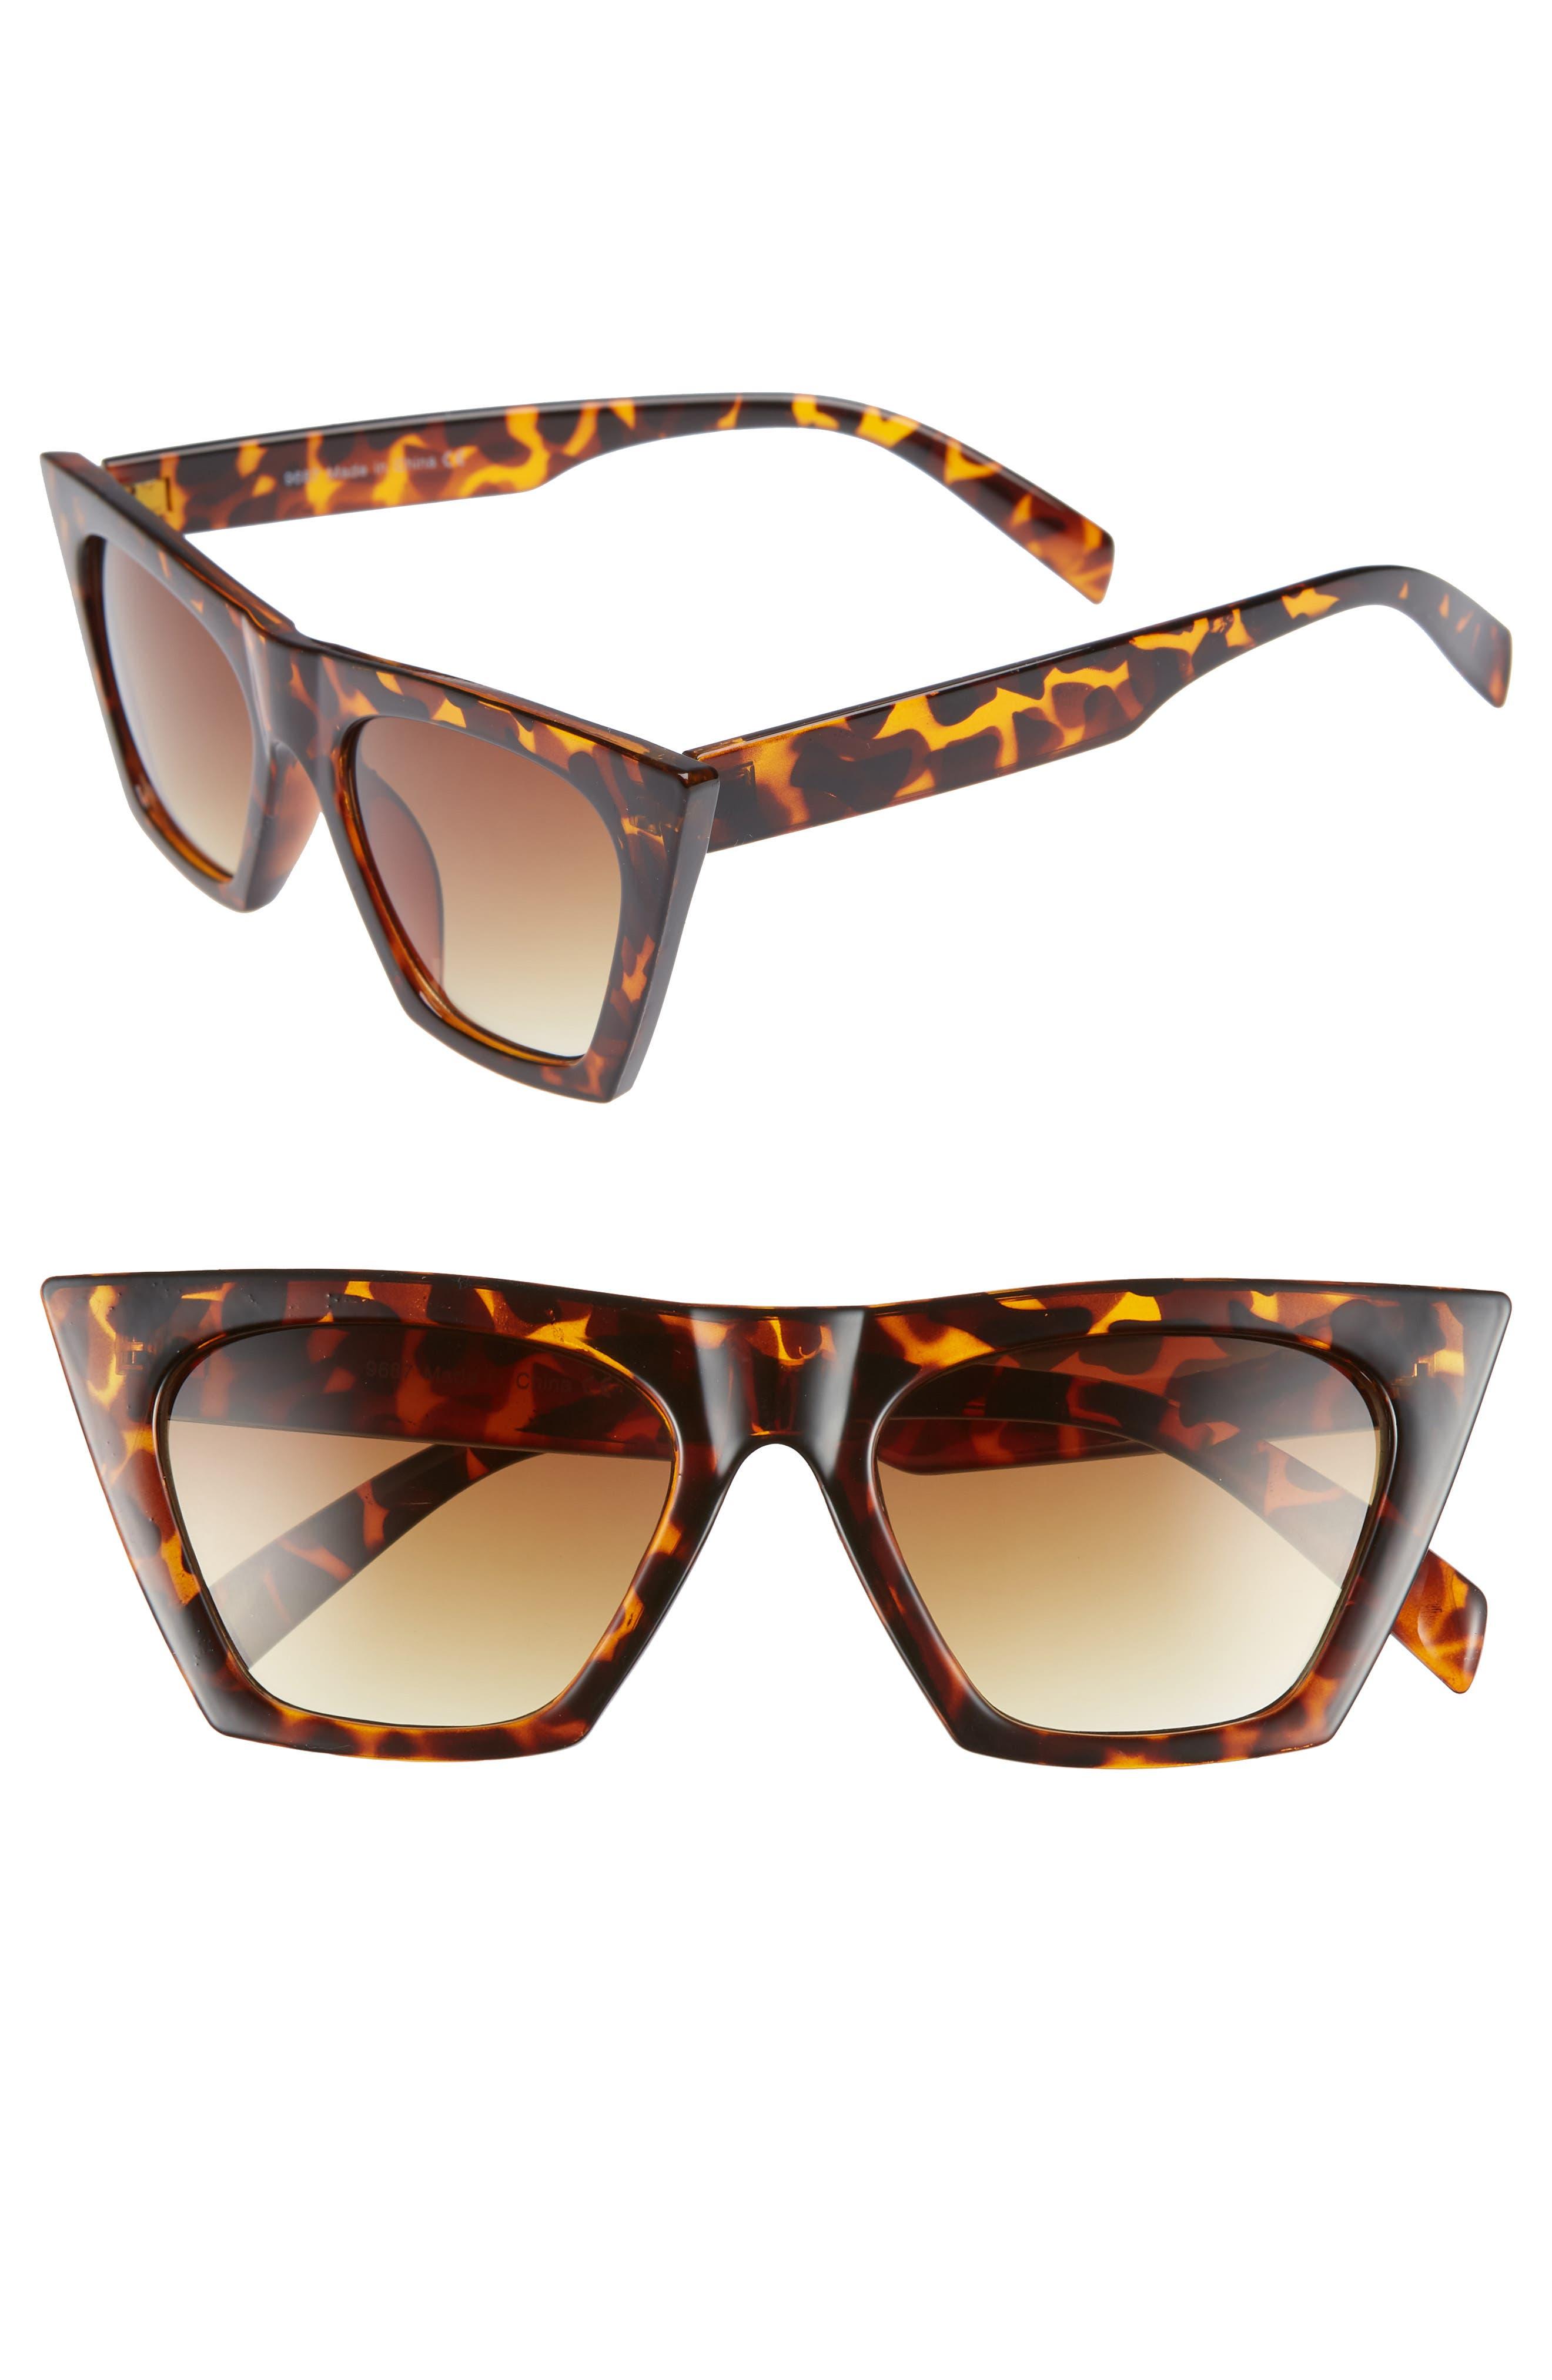 50mm Cat Eye Sunglasses,                             Main thumbnail 1, color,                             BROWN MULTI